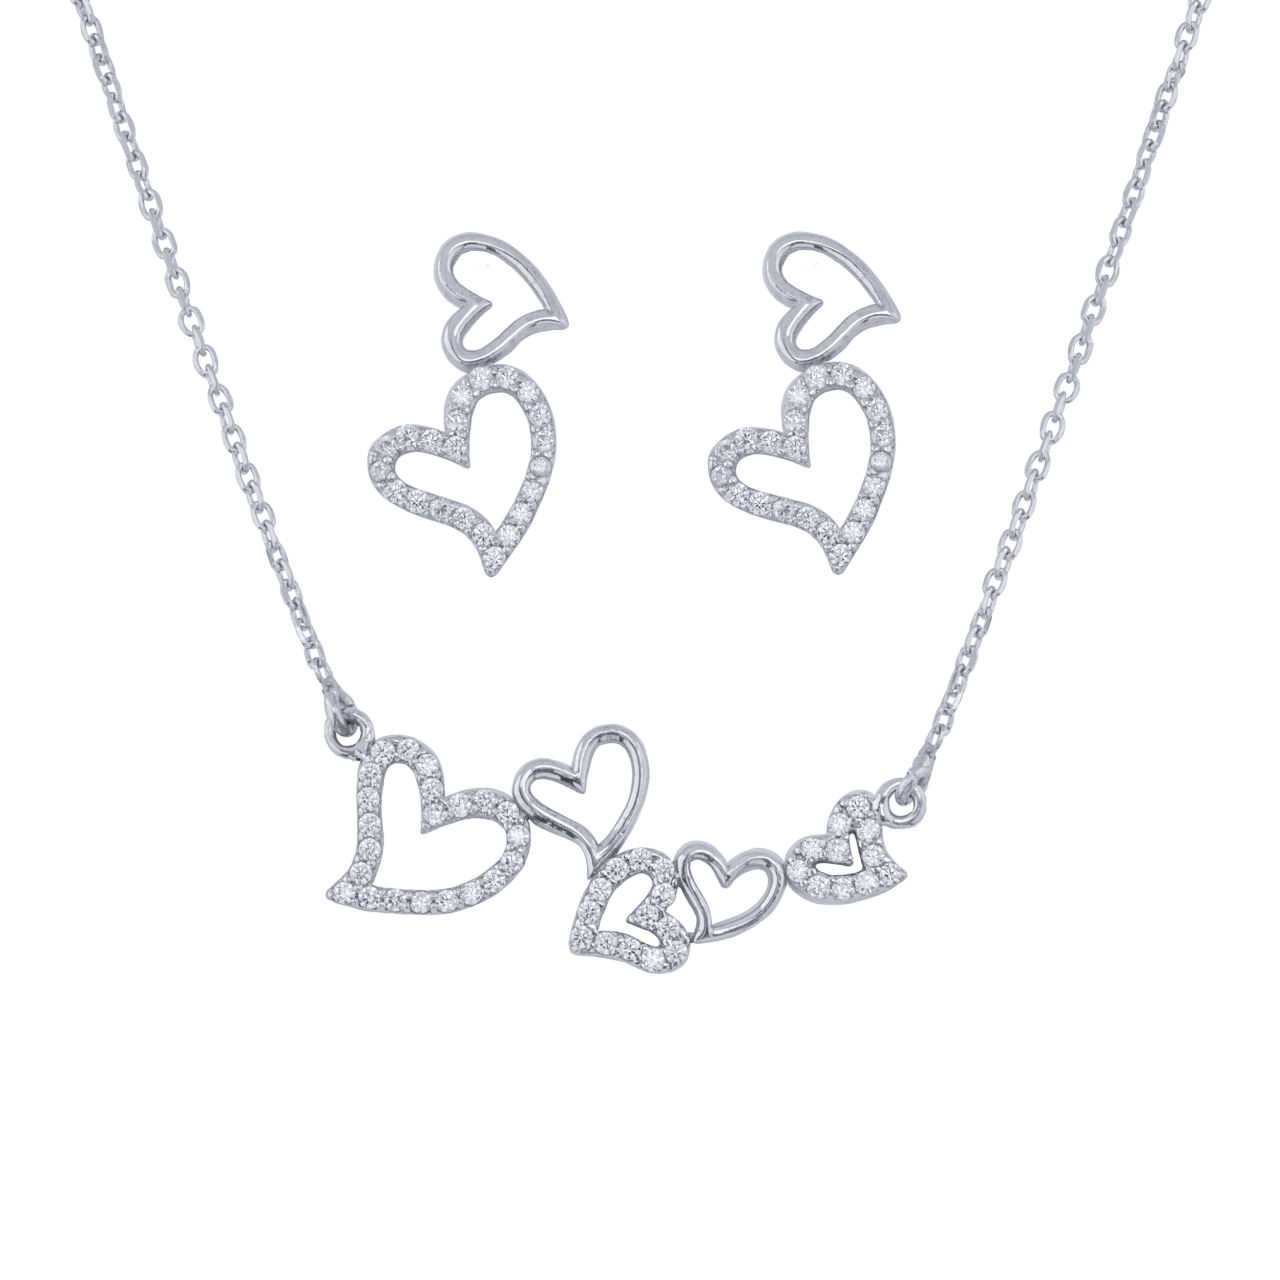 نیم ست نقره زنانه طرح قلب مدل عاشقان کد DS313